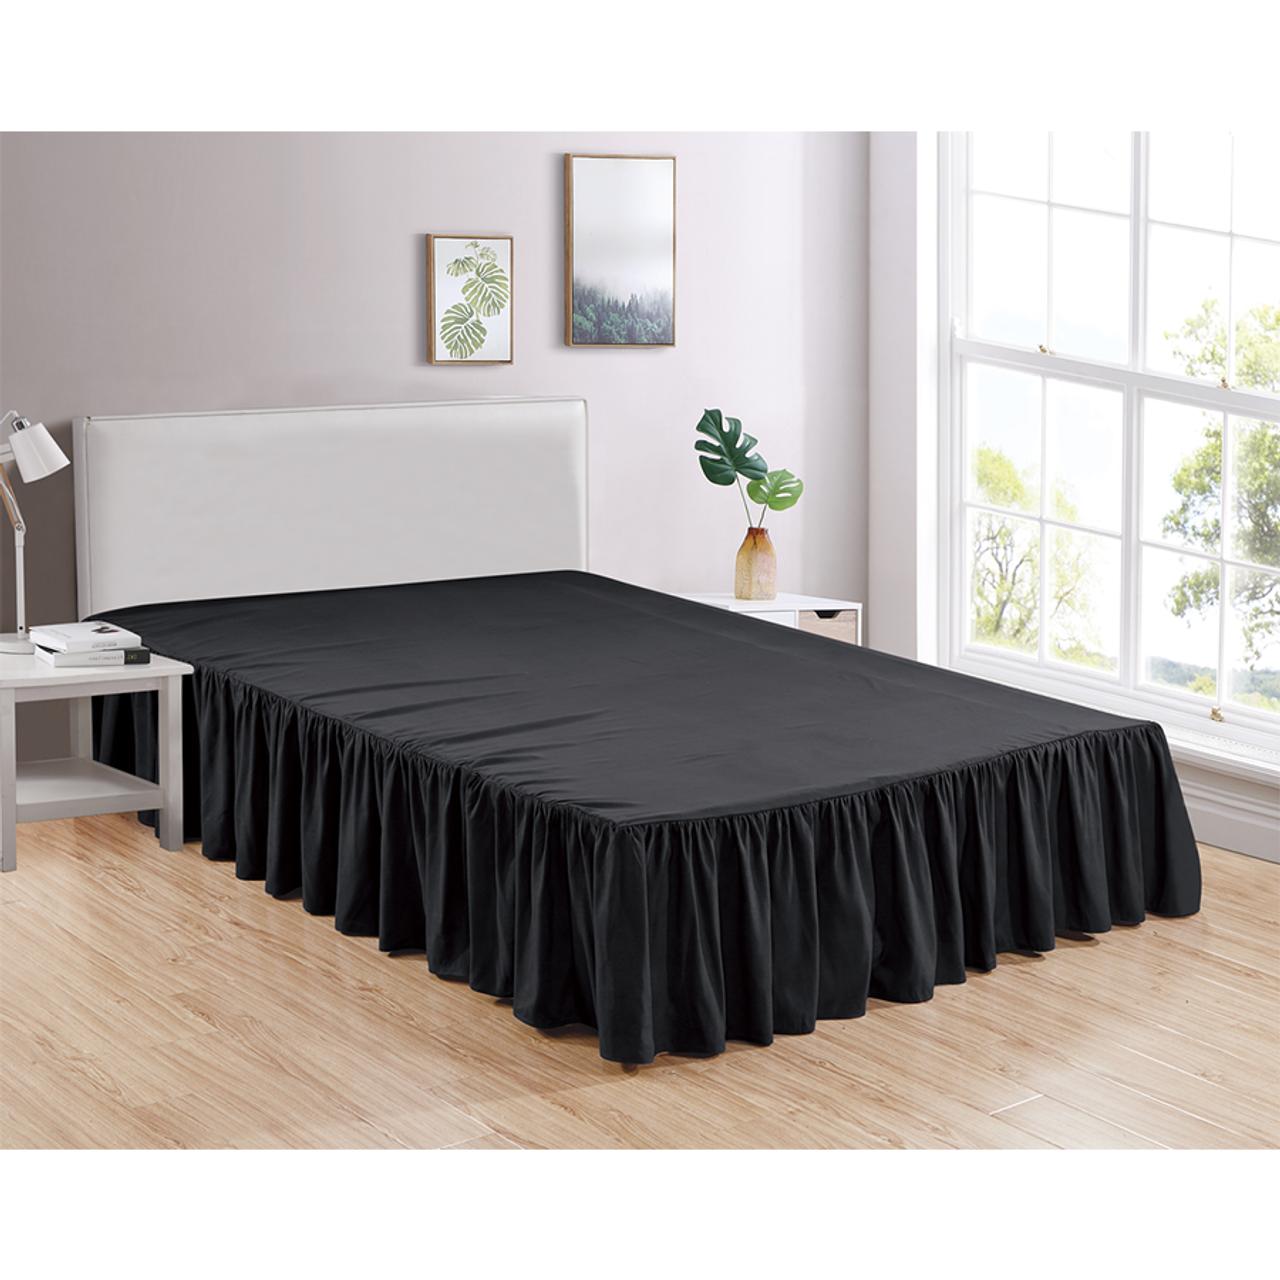 "Black Bed Skirt Soft Dust Ruffle 100% Brushed Microfiber with 14"" Drop in USA, California, New York, New York City, Los Angeles, San Francisco, Pennsylvania, Washington DC, Virginia, Maryland"